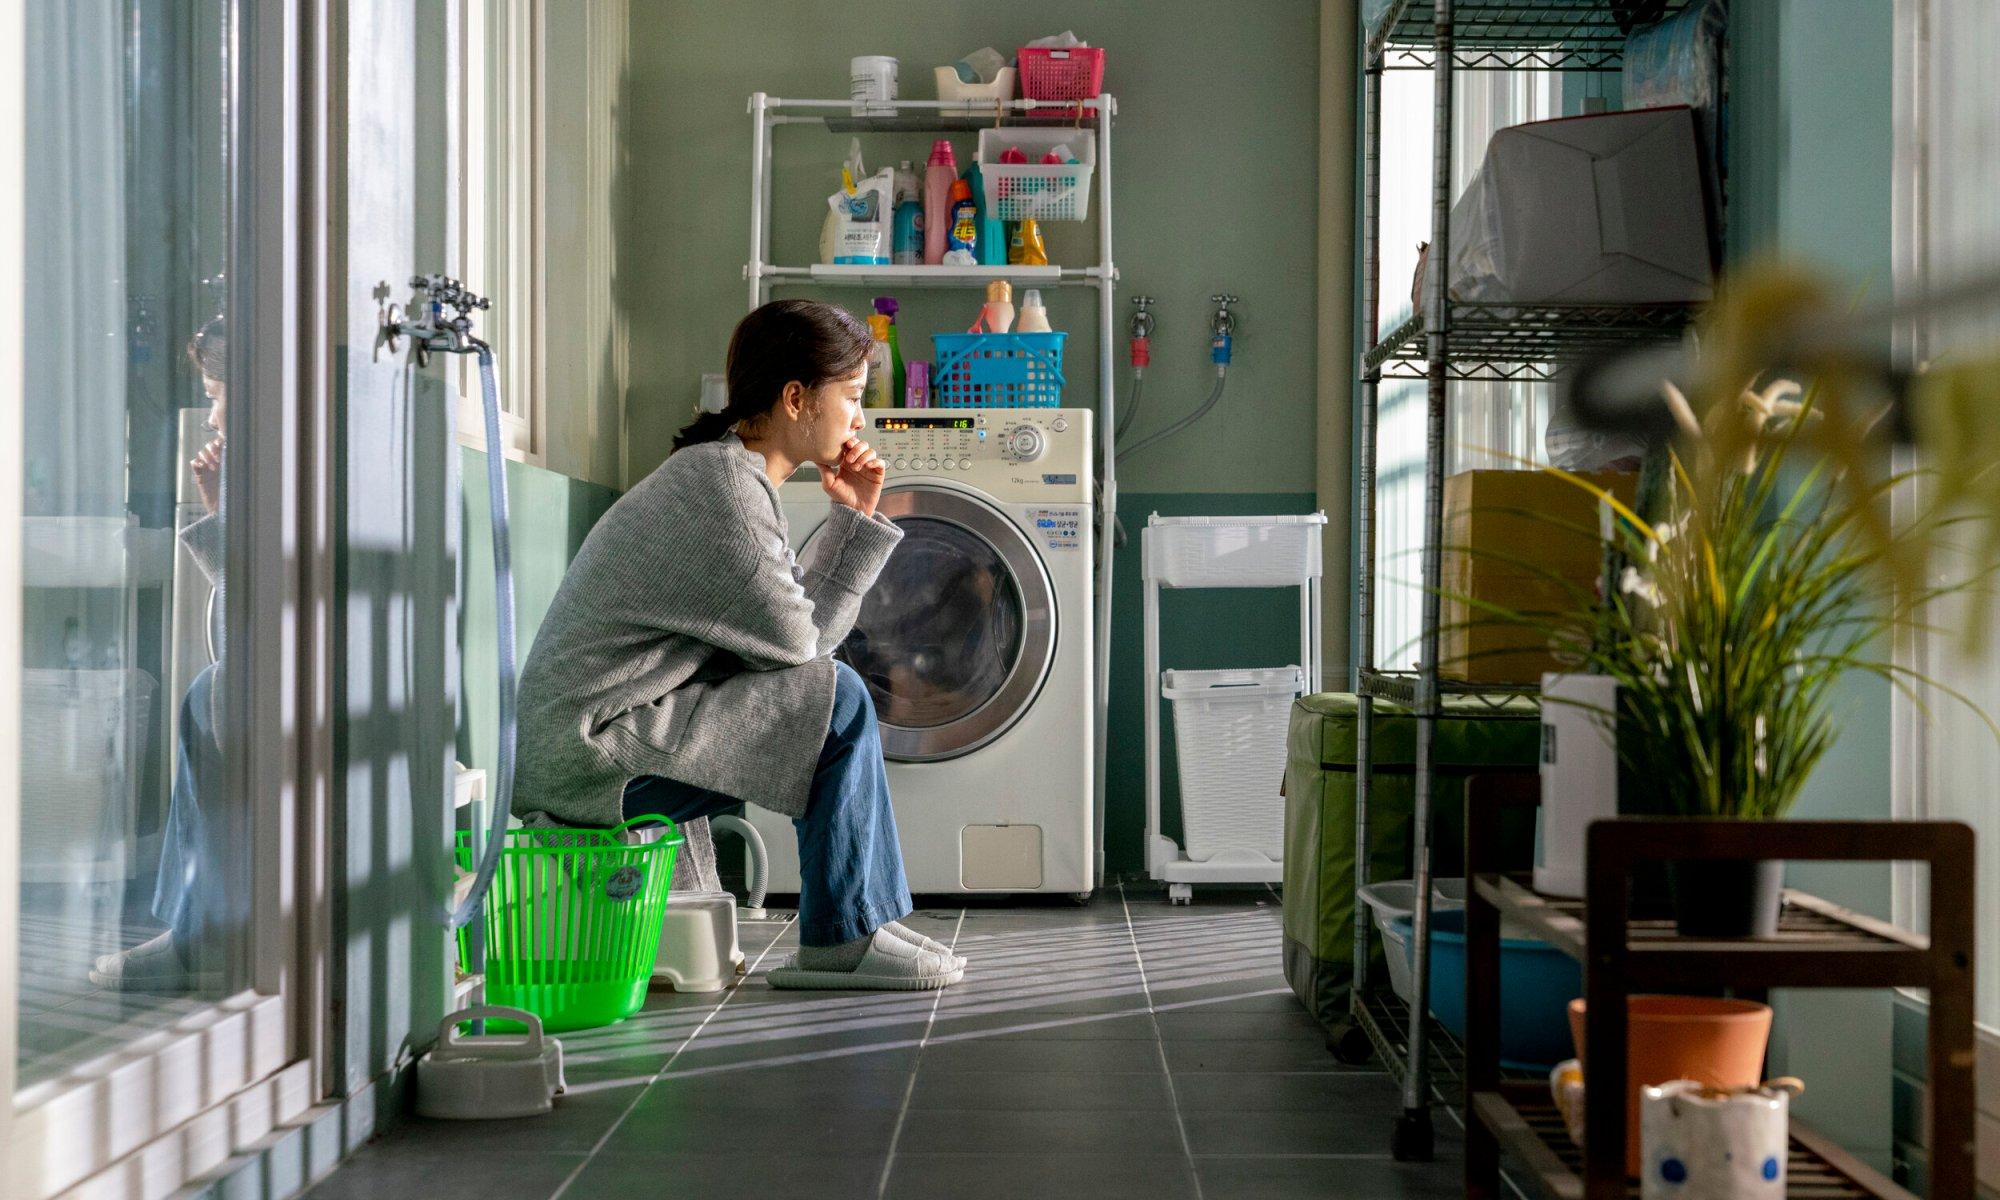 Kim ji young born in 1982 adaptation film roman féministe corée